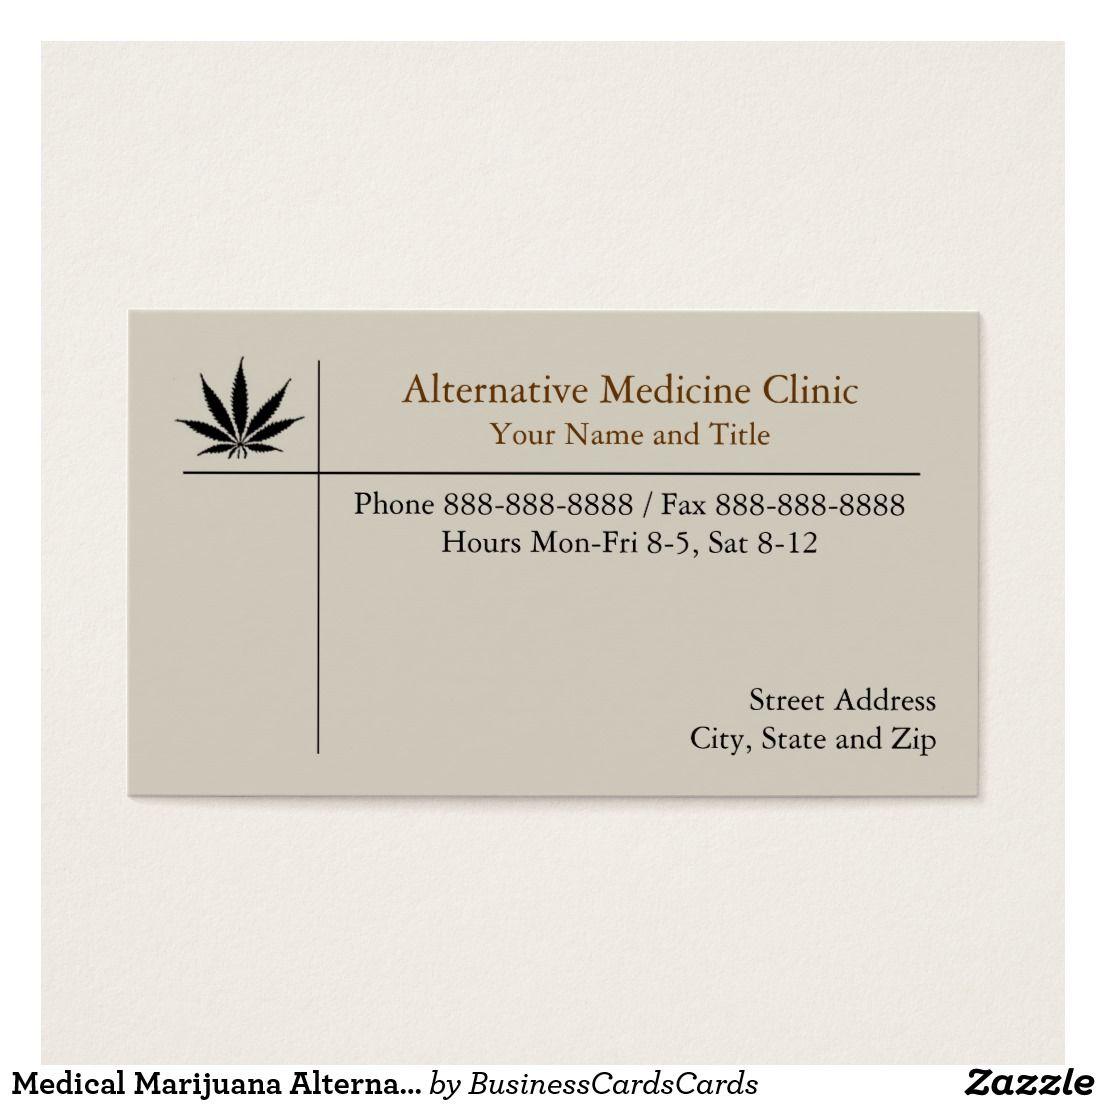 Medical marijuana business cards gallery free business cards medical marijuana business cards choice image free business cards medical marijuana business cards gallery free business magicingreecefo Choice Image